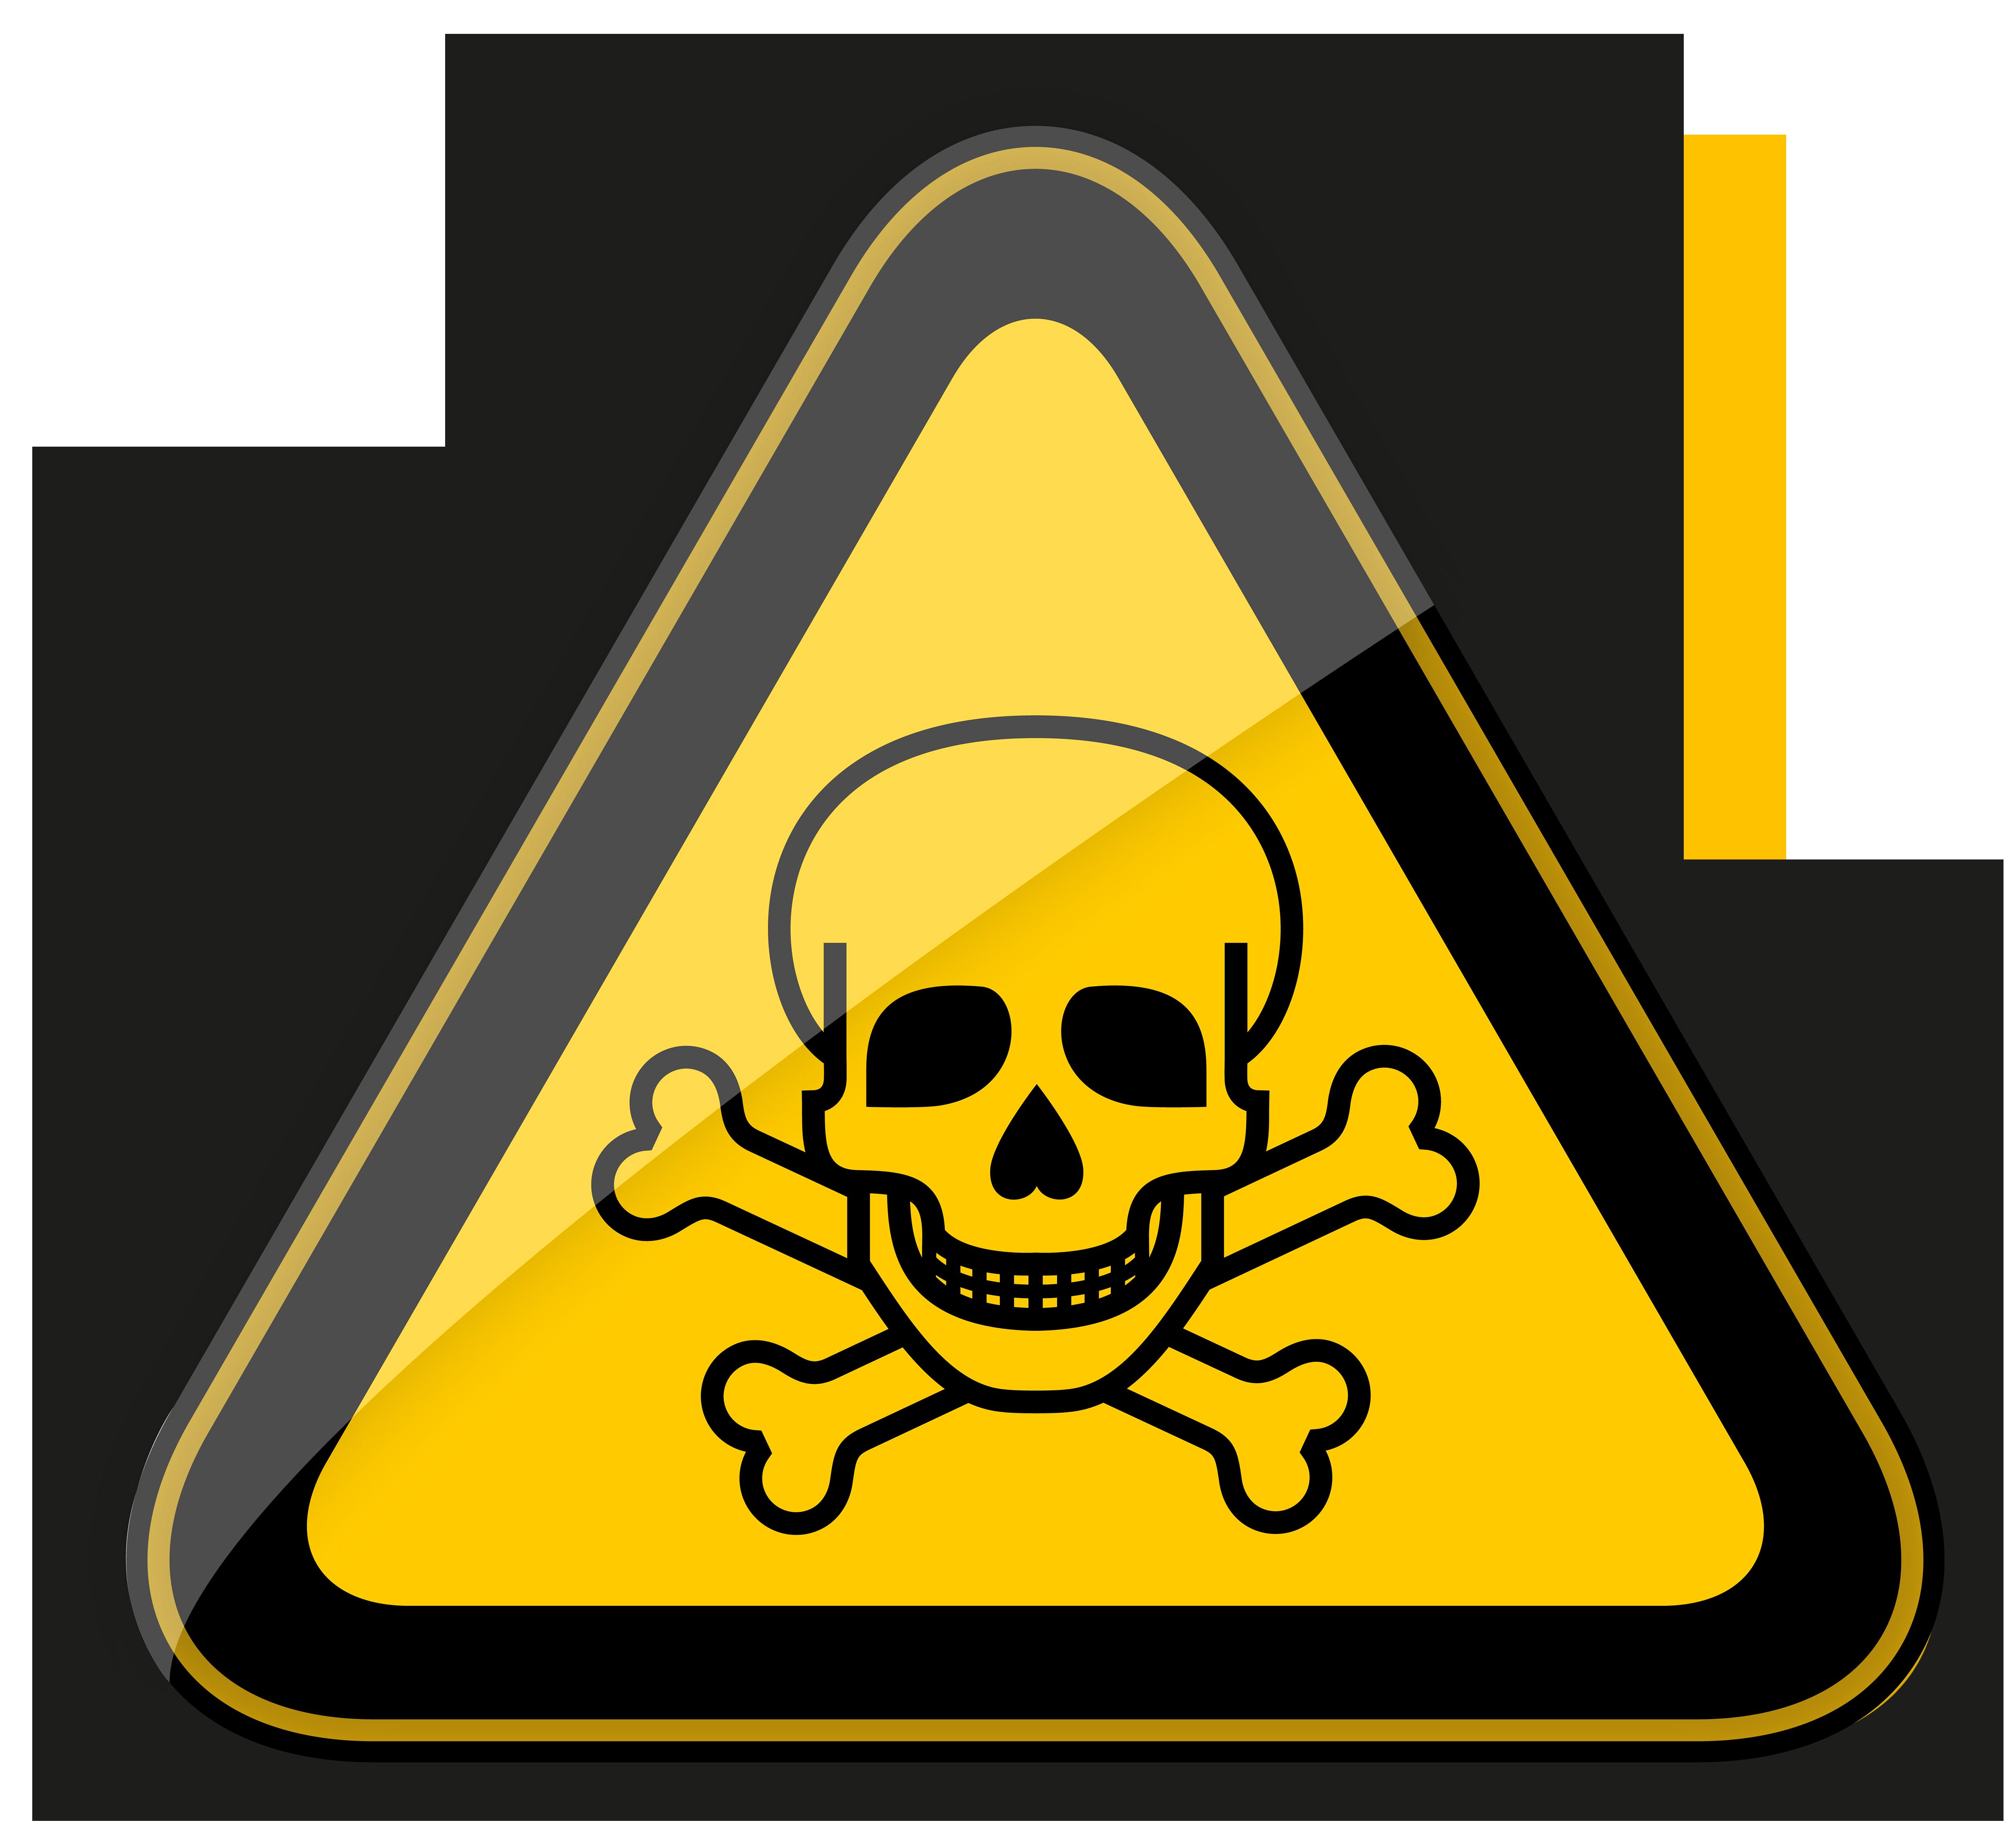 Pie clipart triangle. Toxic harmful warning symbol